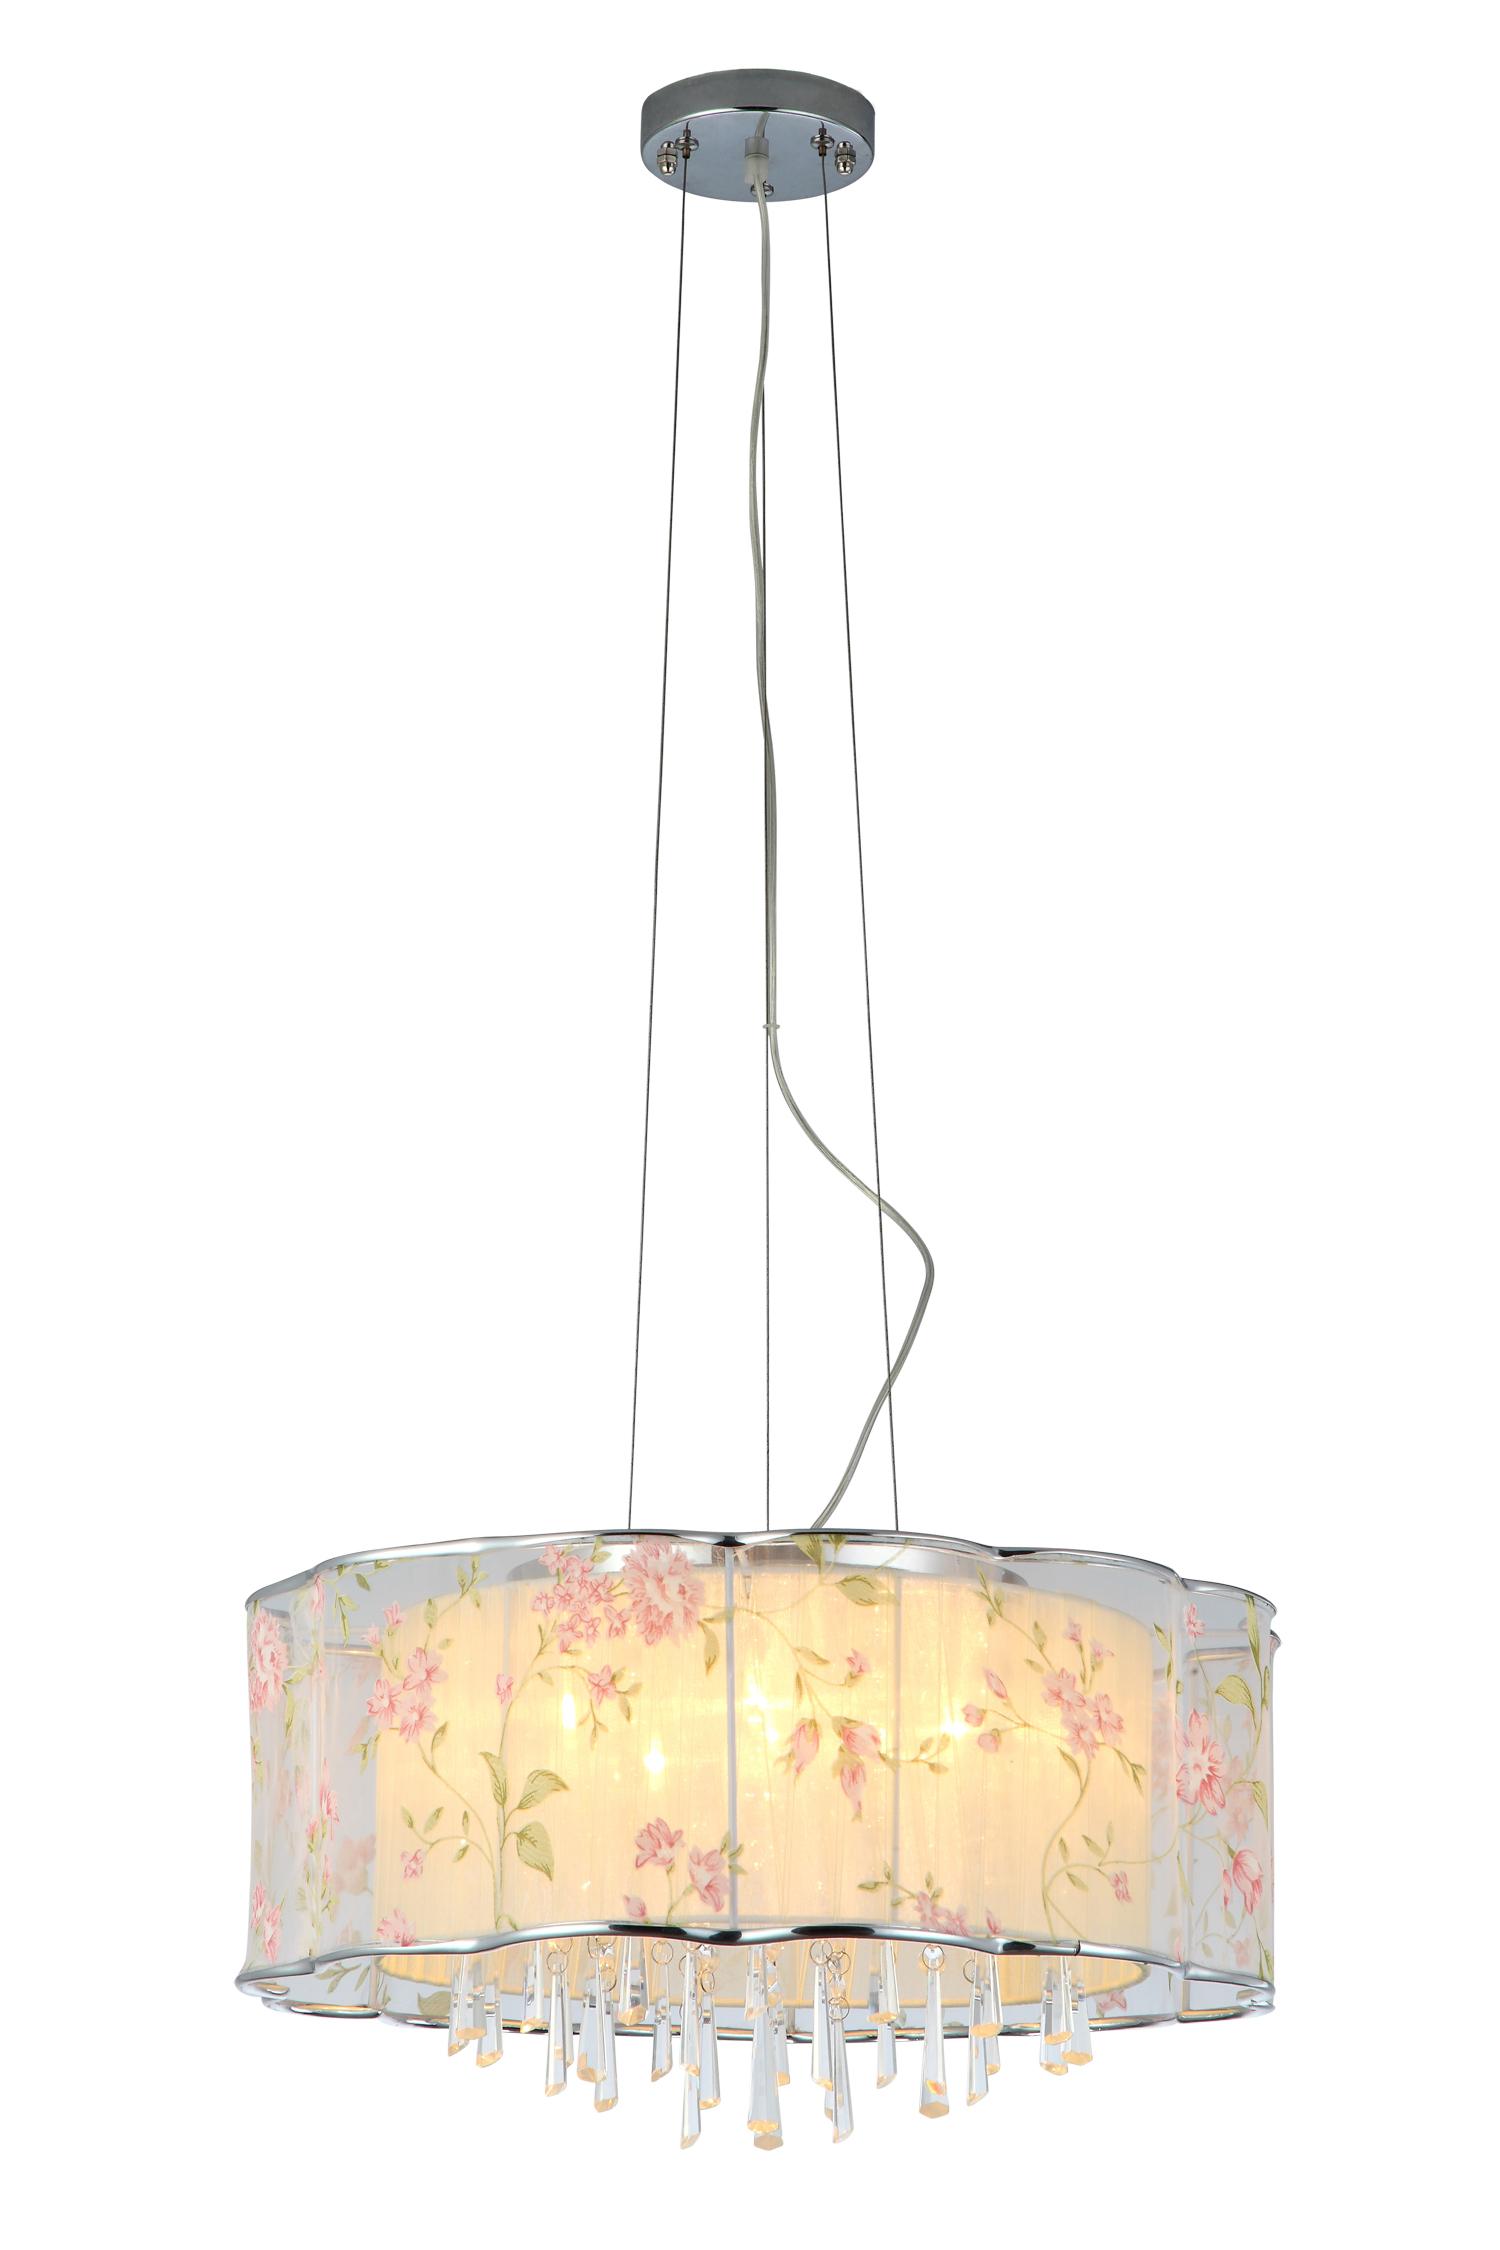 Люстра Lamplandia 3185-6 selena lamplandia подвесная люстра lamplandia 9004 6 veronica